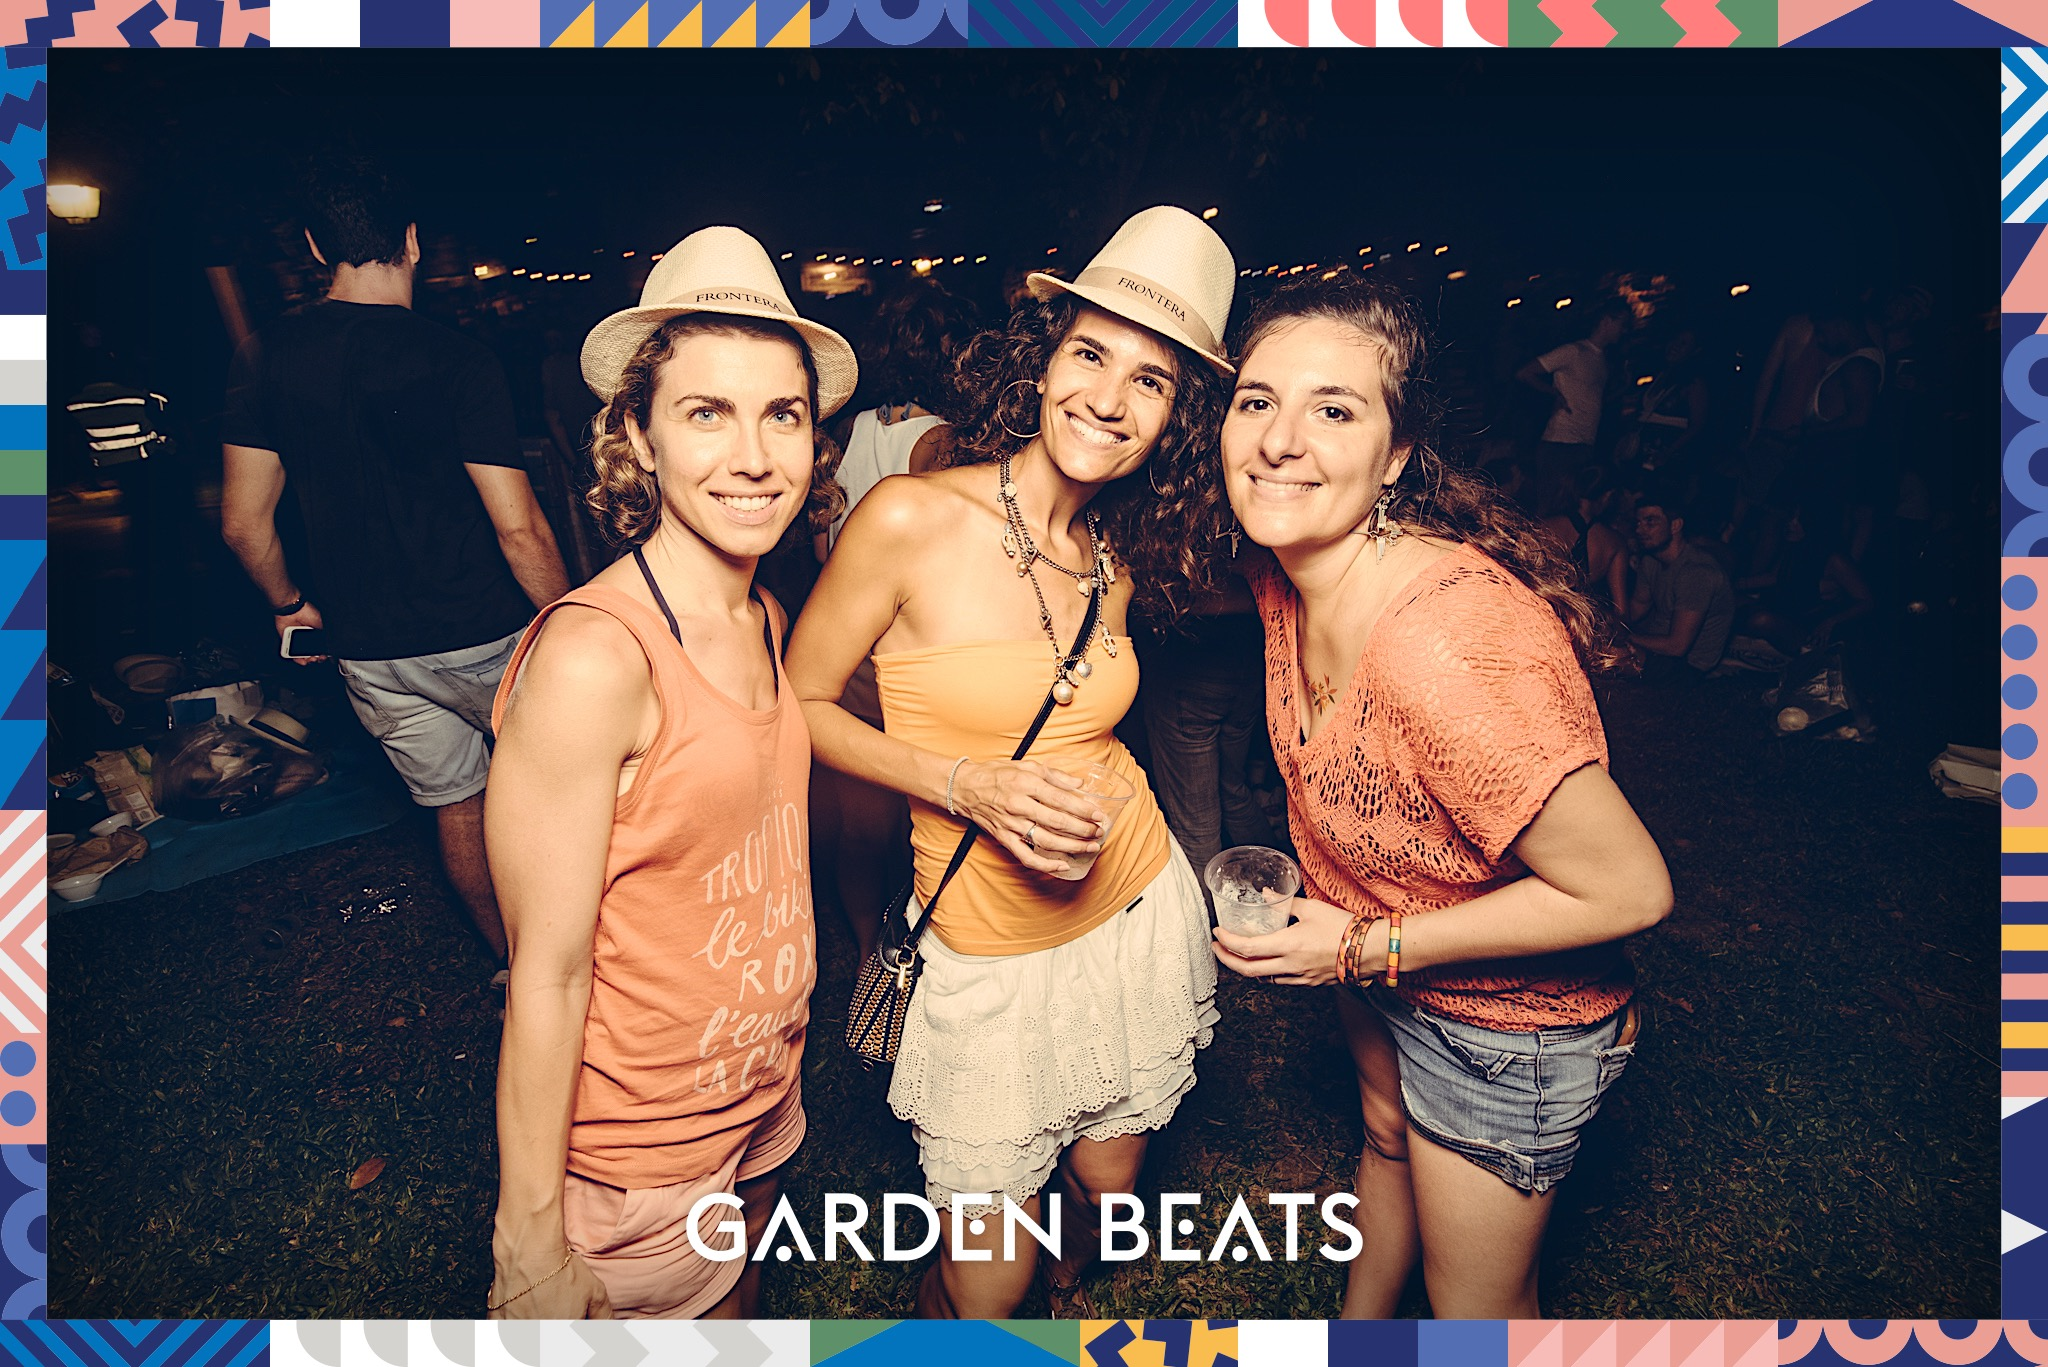 18032017_GardenBeats_Colossal773_WatermarkedGB.jpg